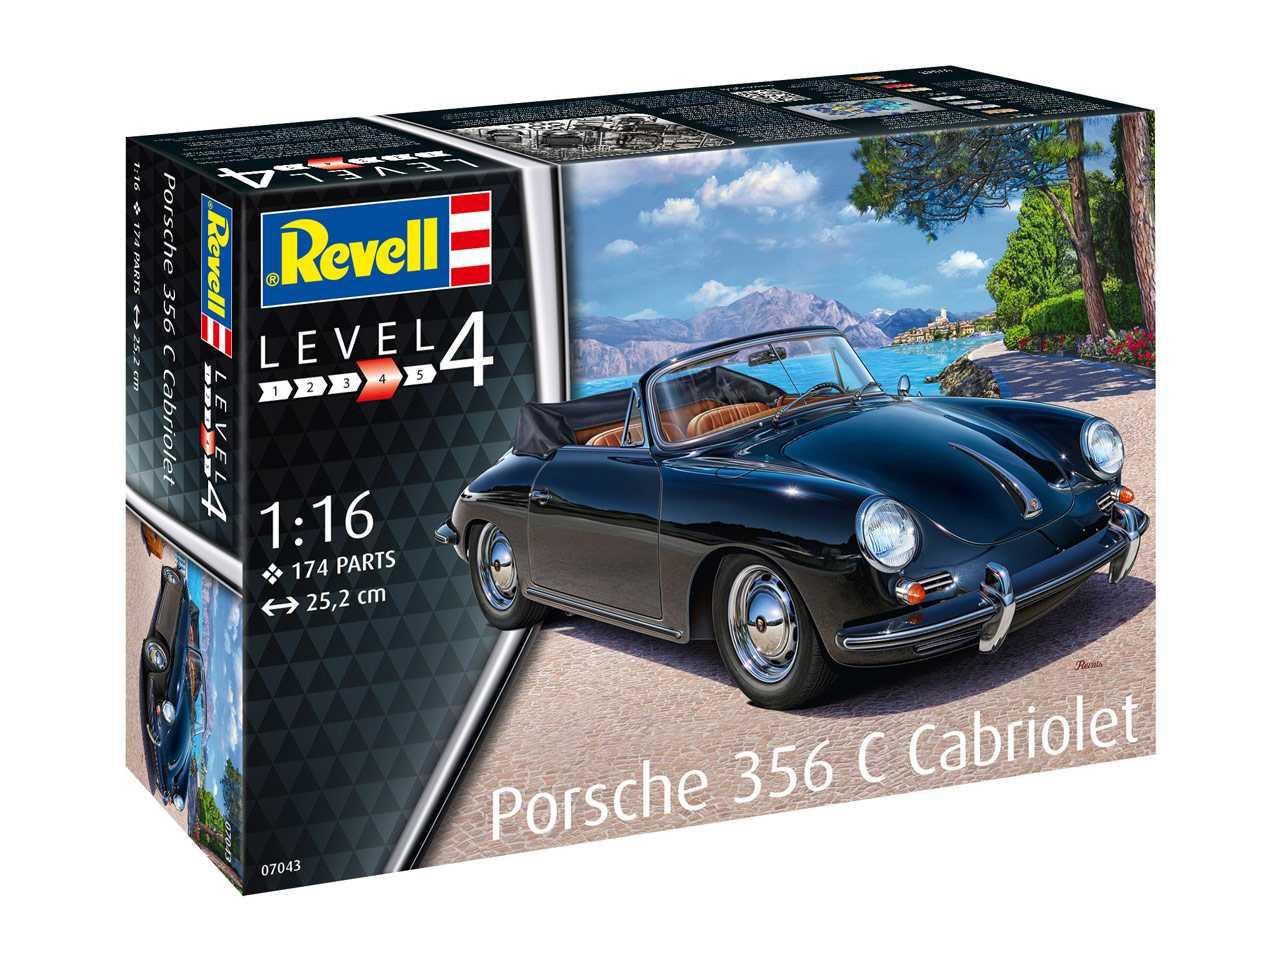 Náhled produktu - 1:16 Porsche 356 Cabriolet